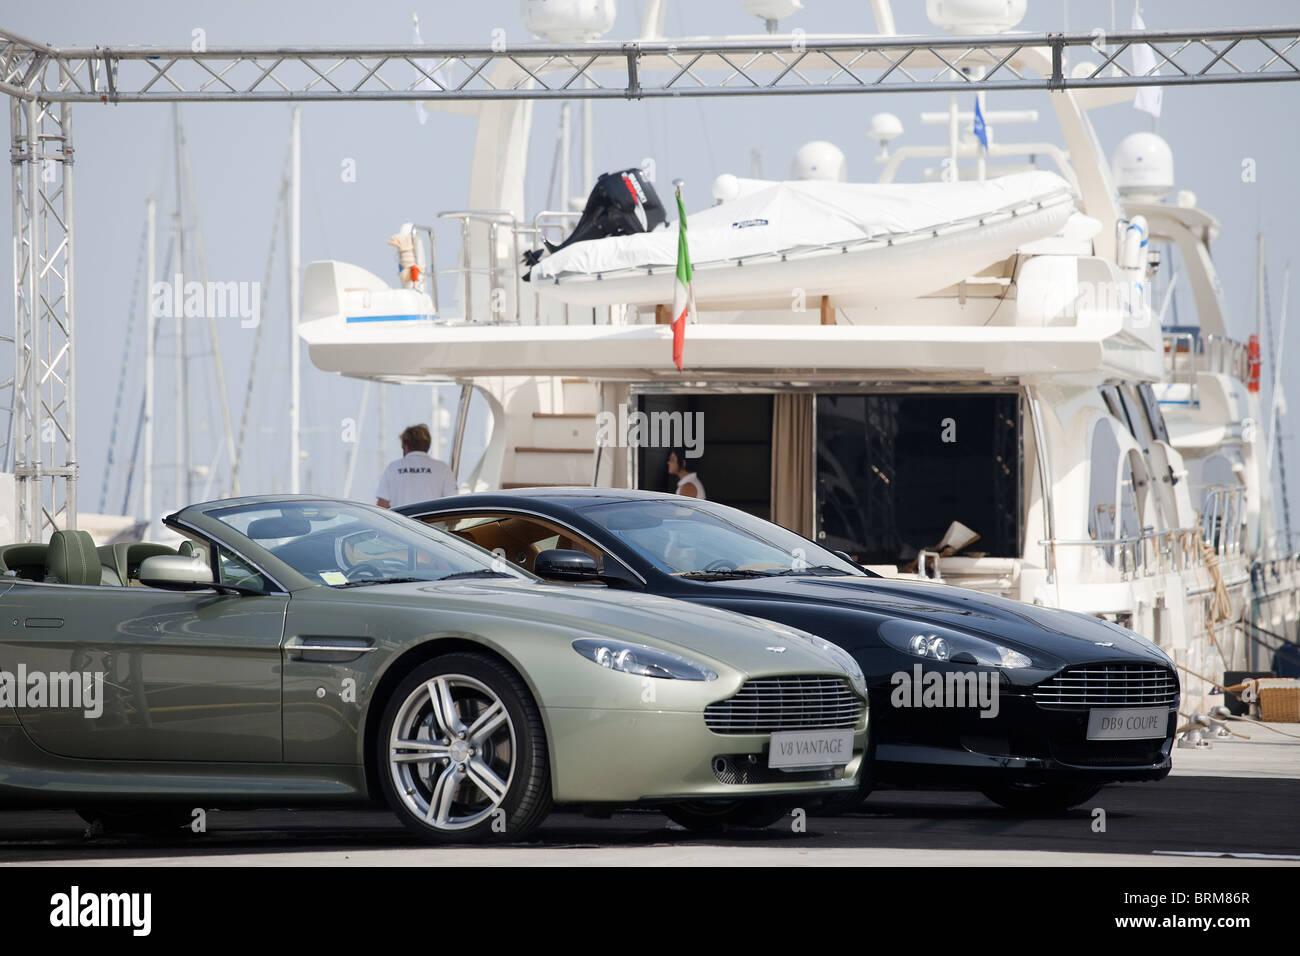 Aston Martin Luxury Car And Yacht Exibition Stock Photo 31792959